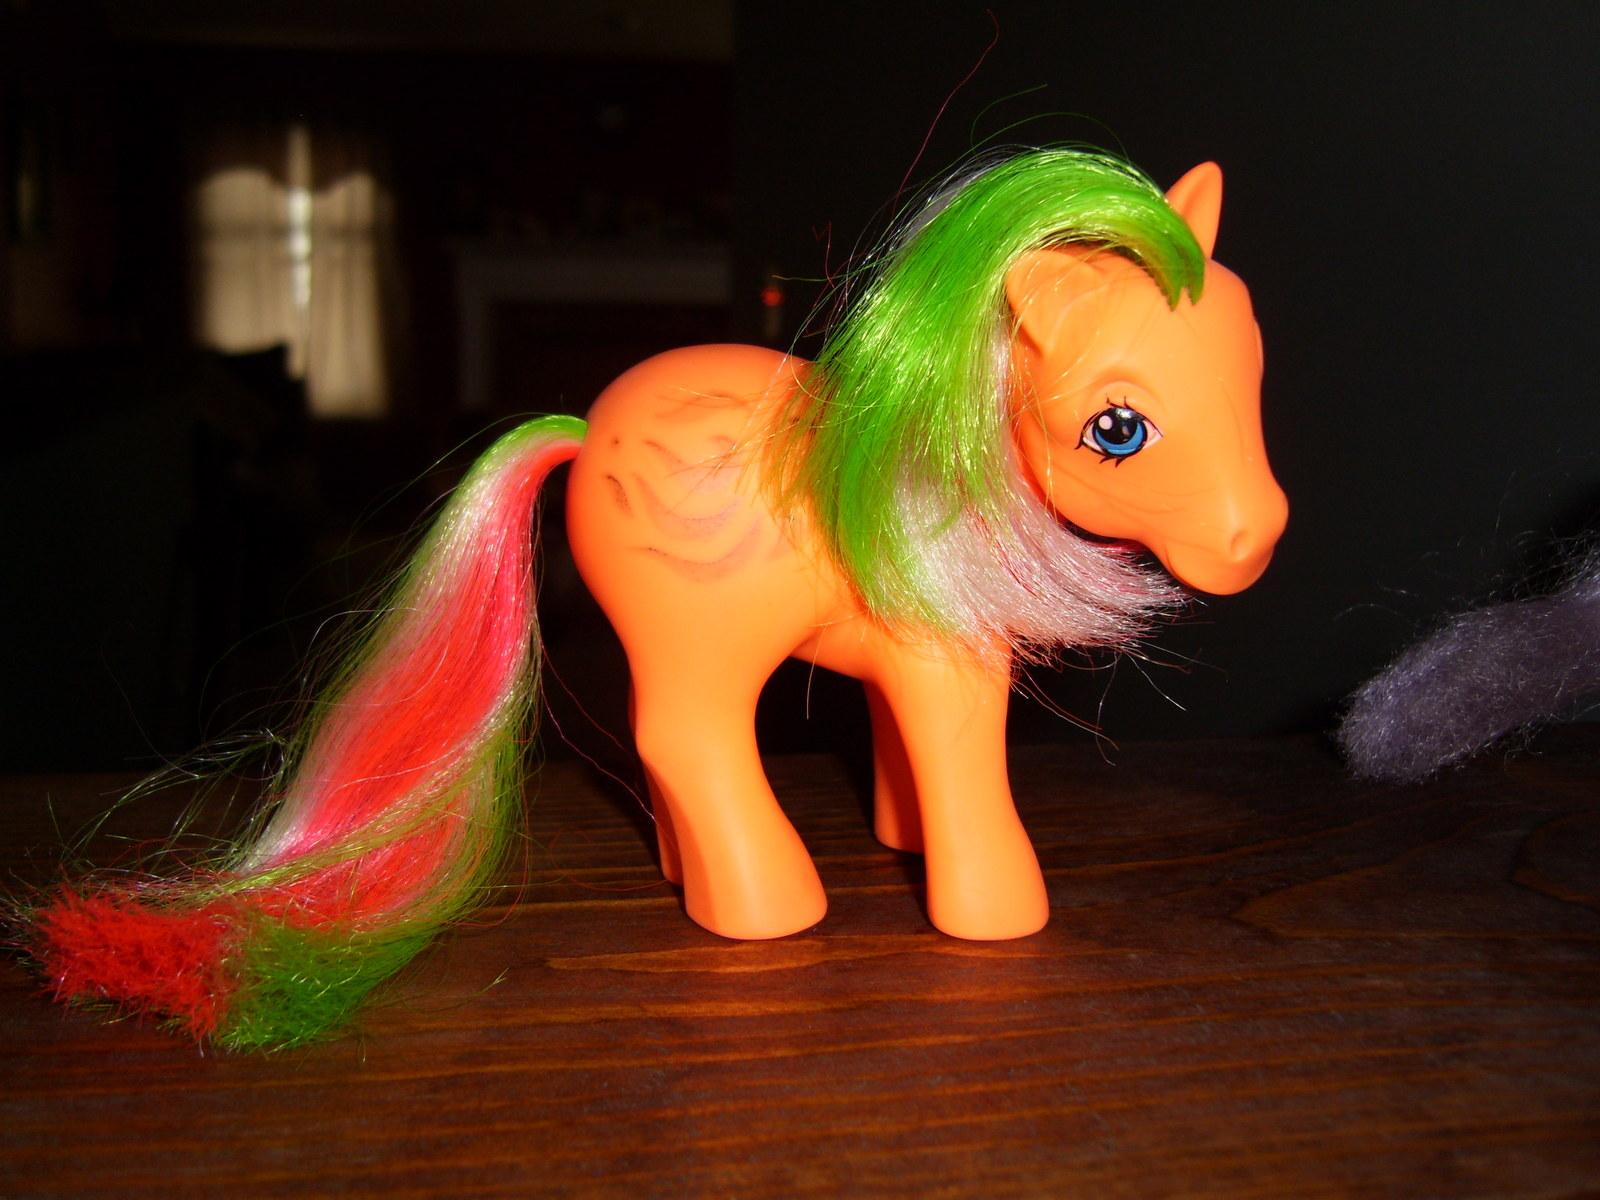 My Little Pony G1 Argie Windy (green hair)